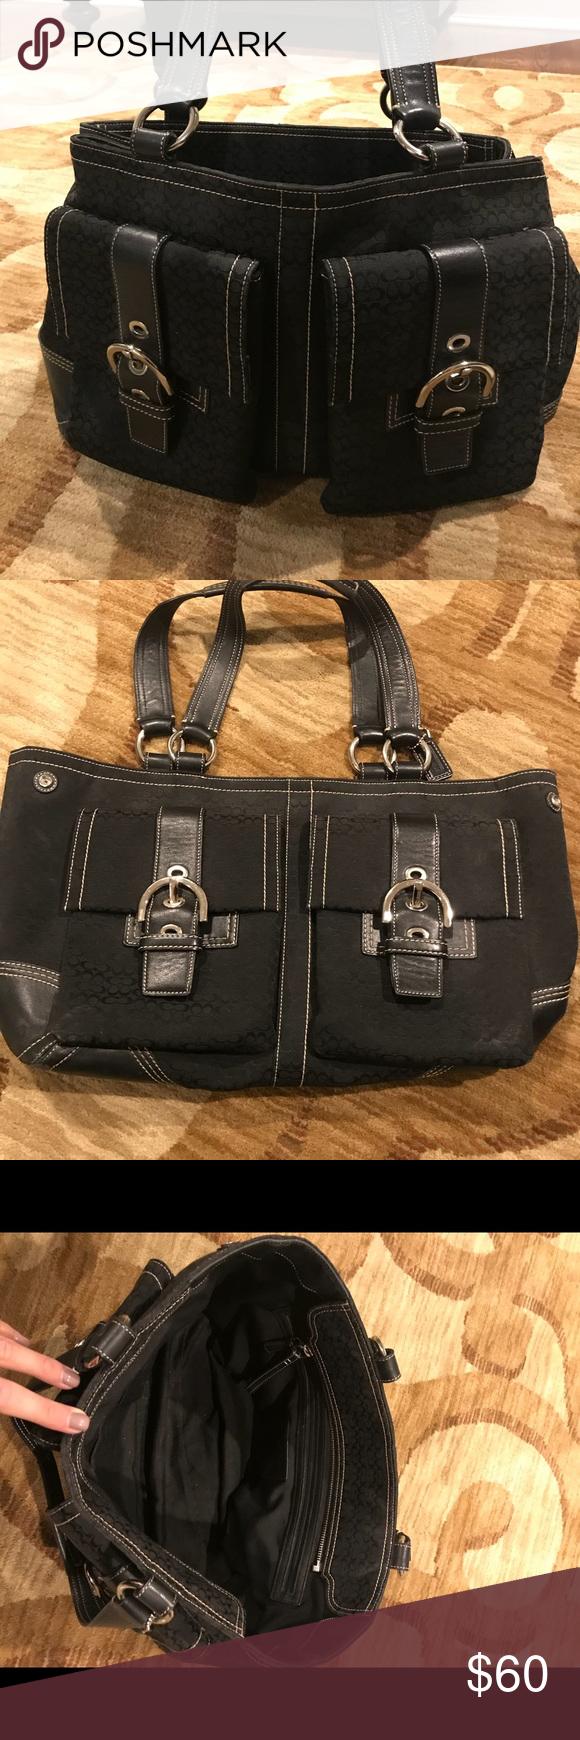 Spotted while shopping on Poshmark  Coach Vintage Soho Hobo Cargo Tote  Shoulder Bag!  poshmark  fashion  shopping  style  Coach  Handbags 58dae510c7